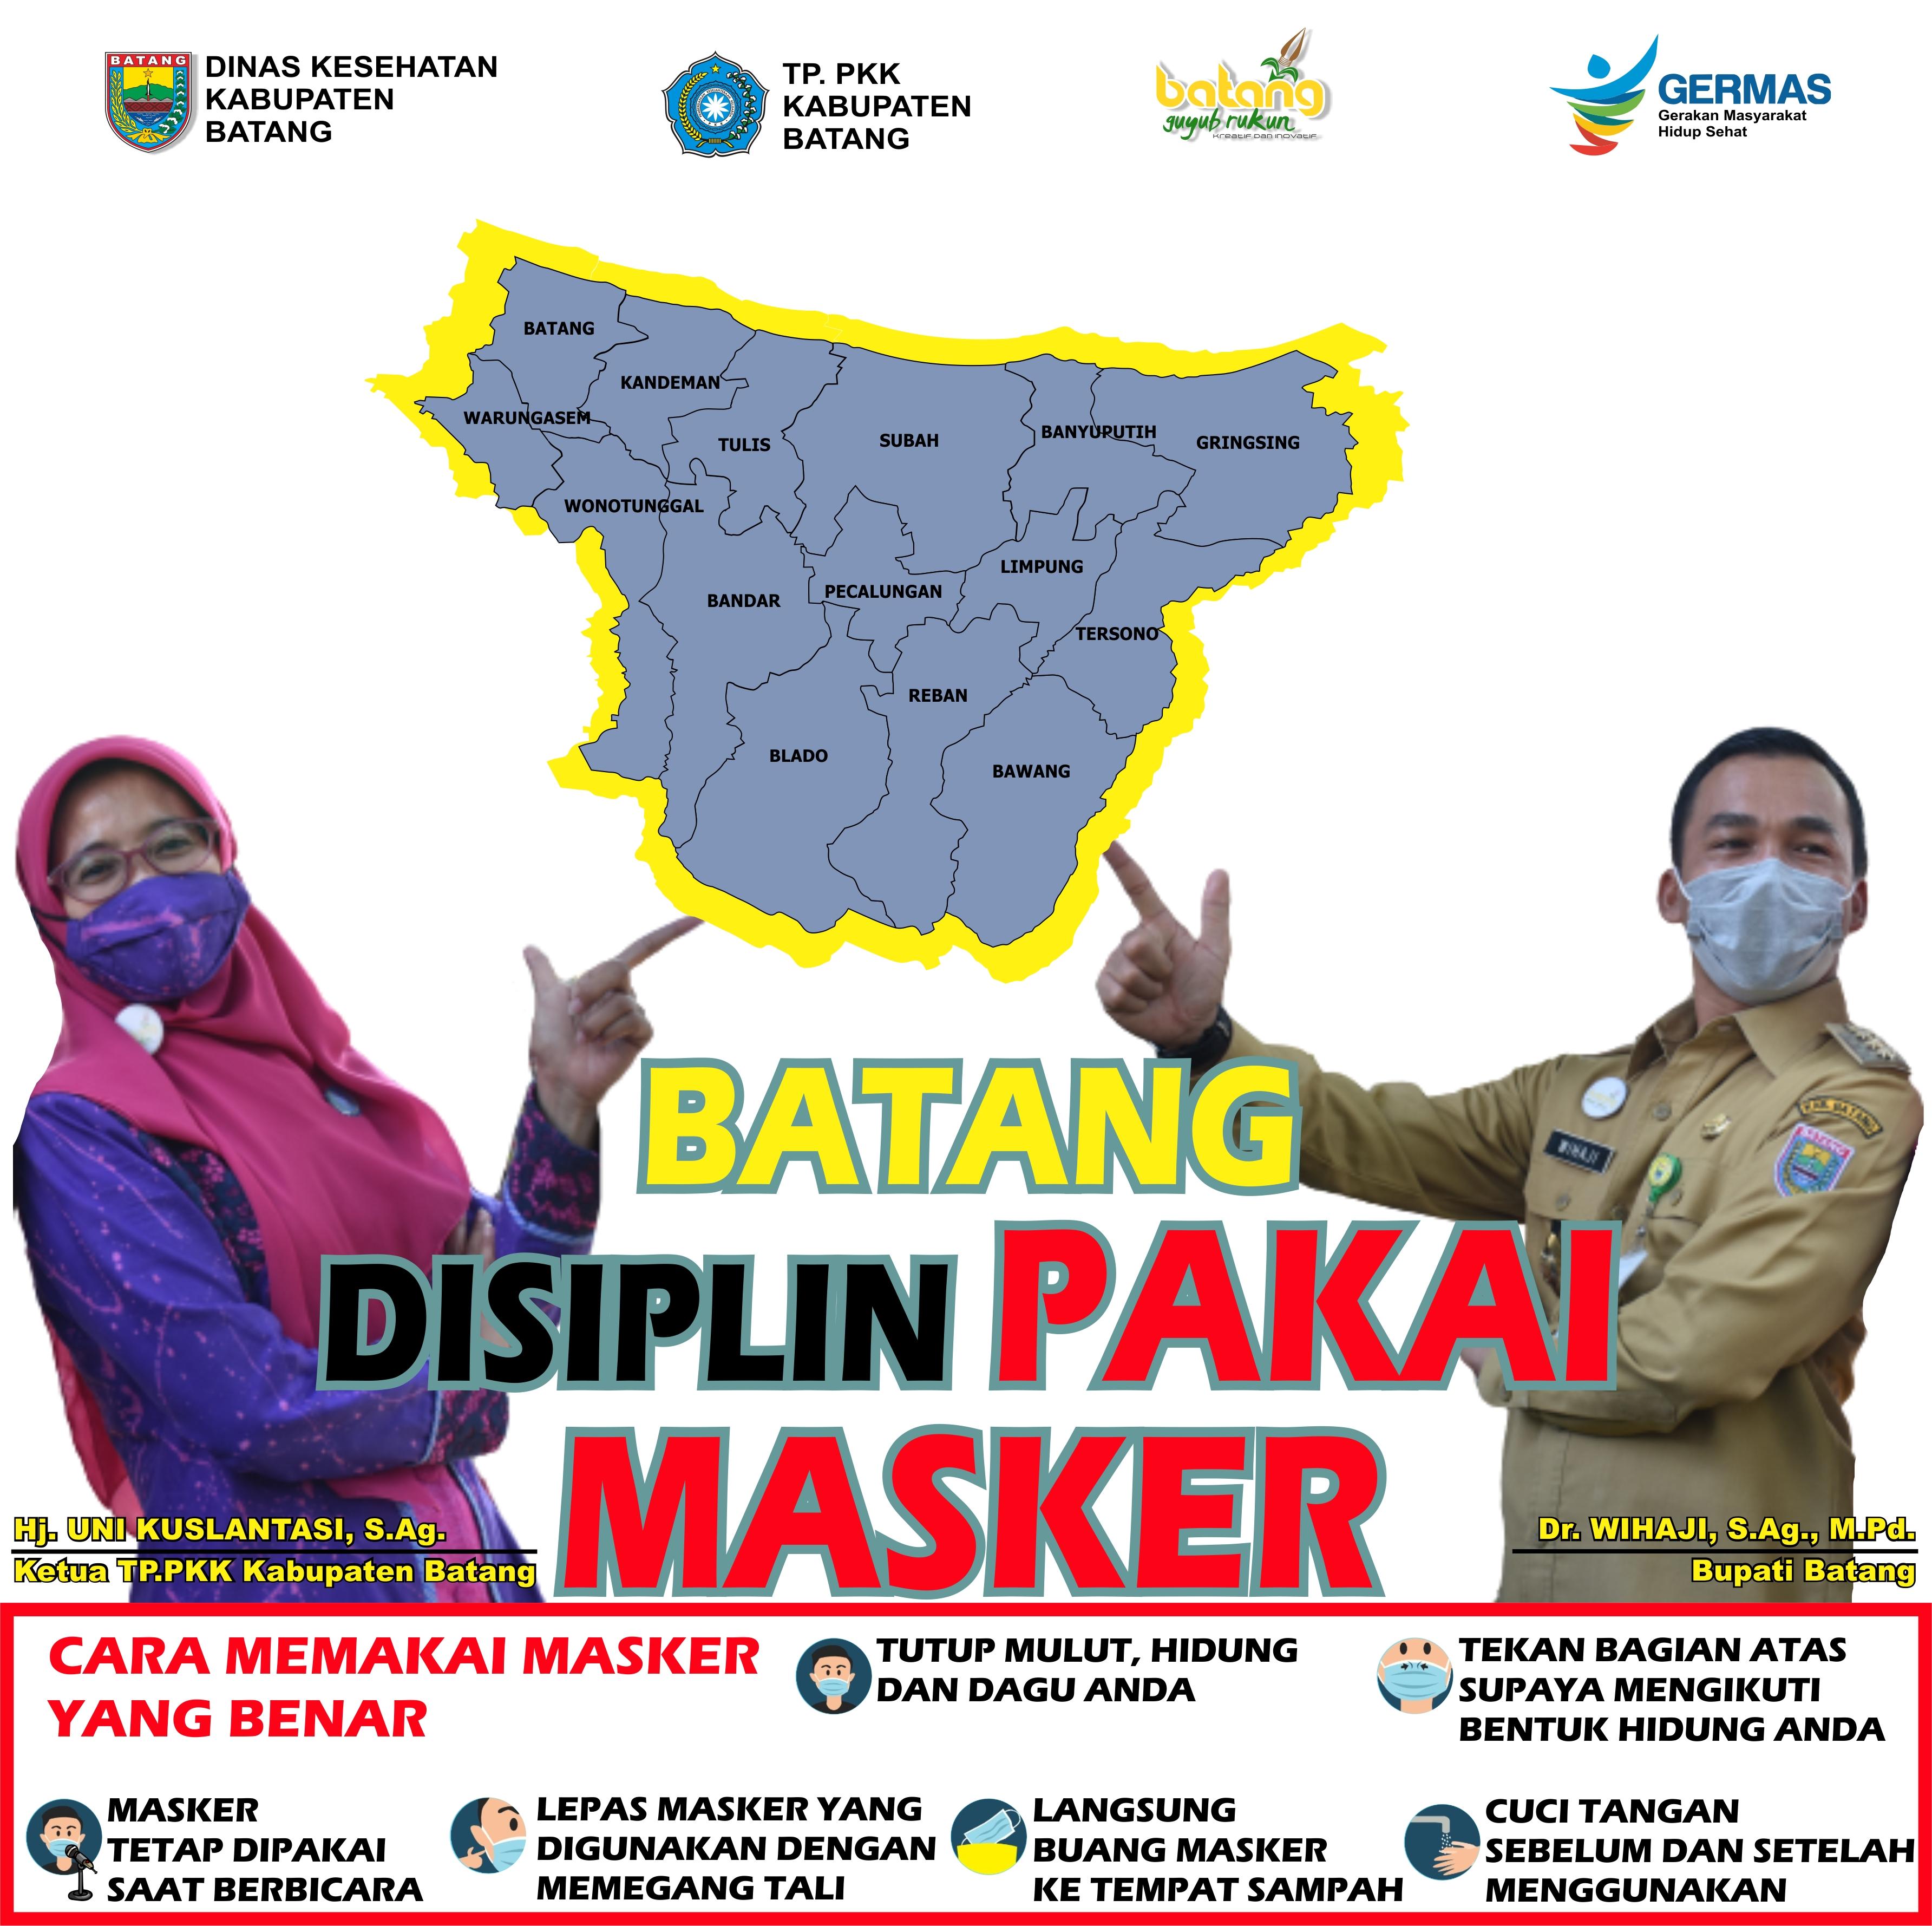 Batang Disiplin Pakai Masker